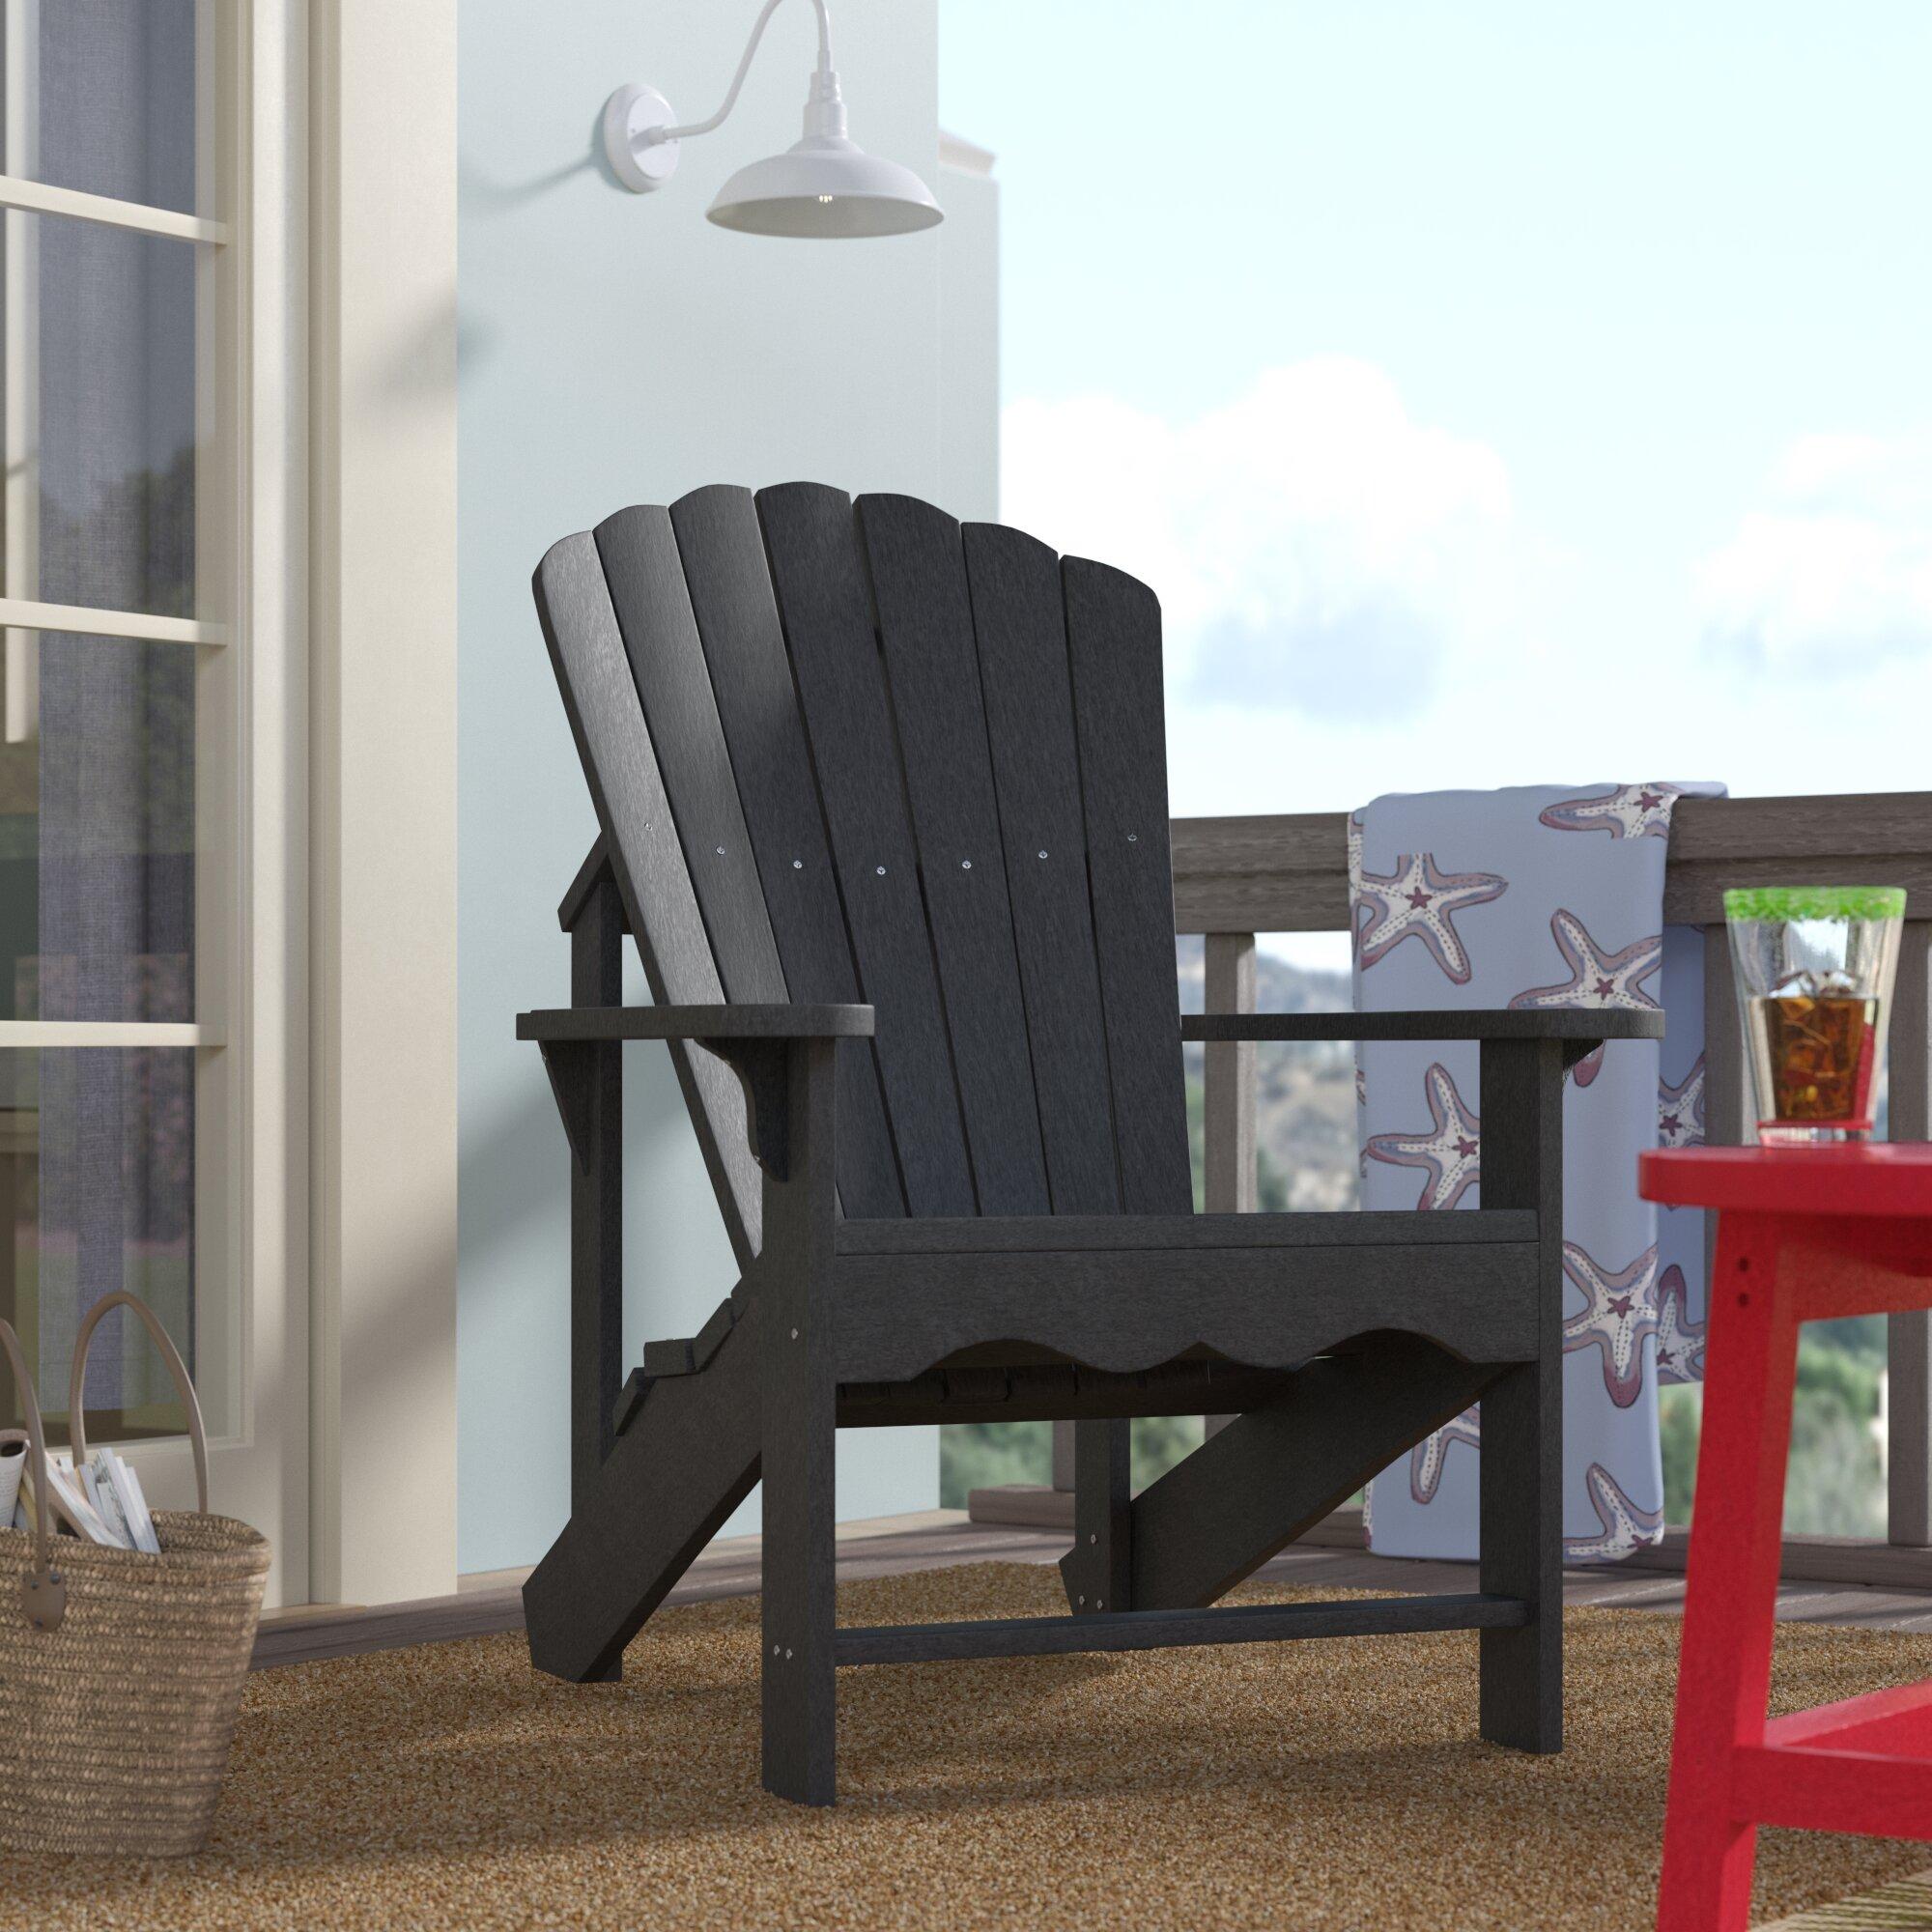 Amazing Sandiford Plastic Adirondack Chair Download Free Architecture Designs Embacsunscenecom